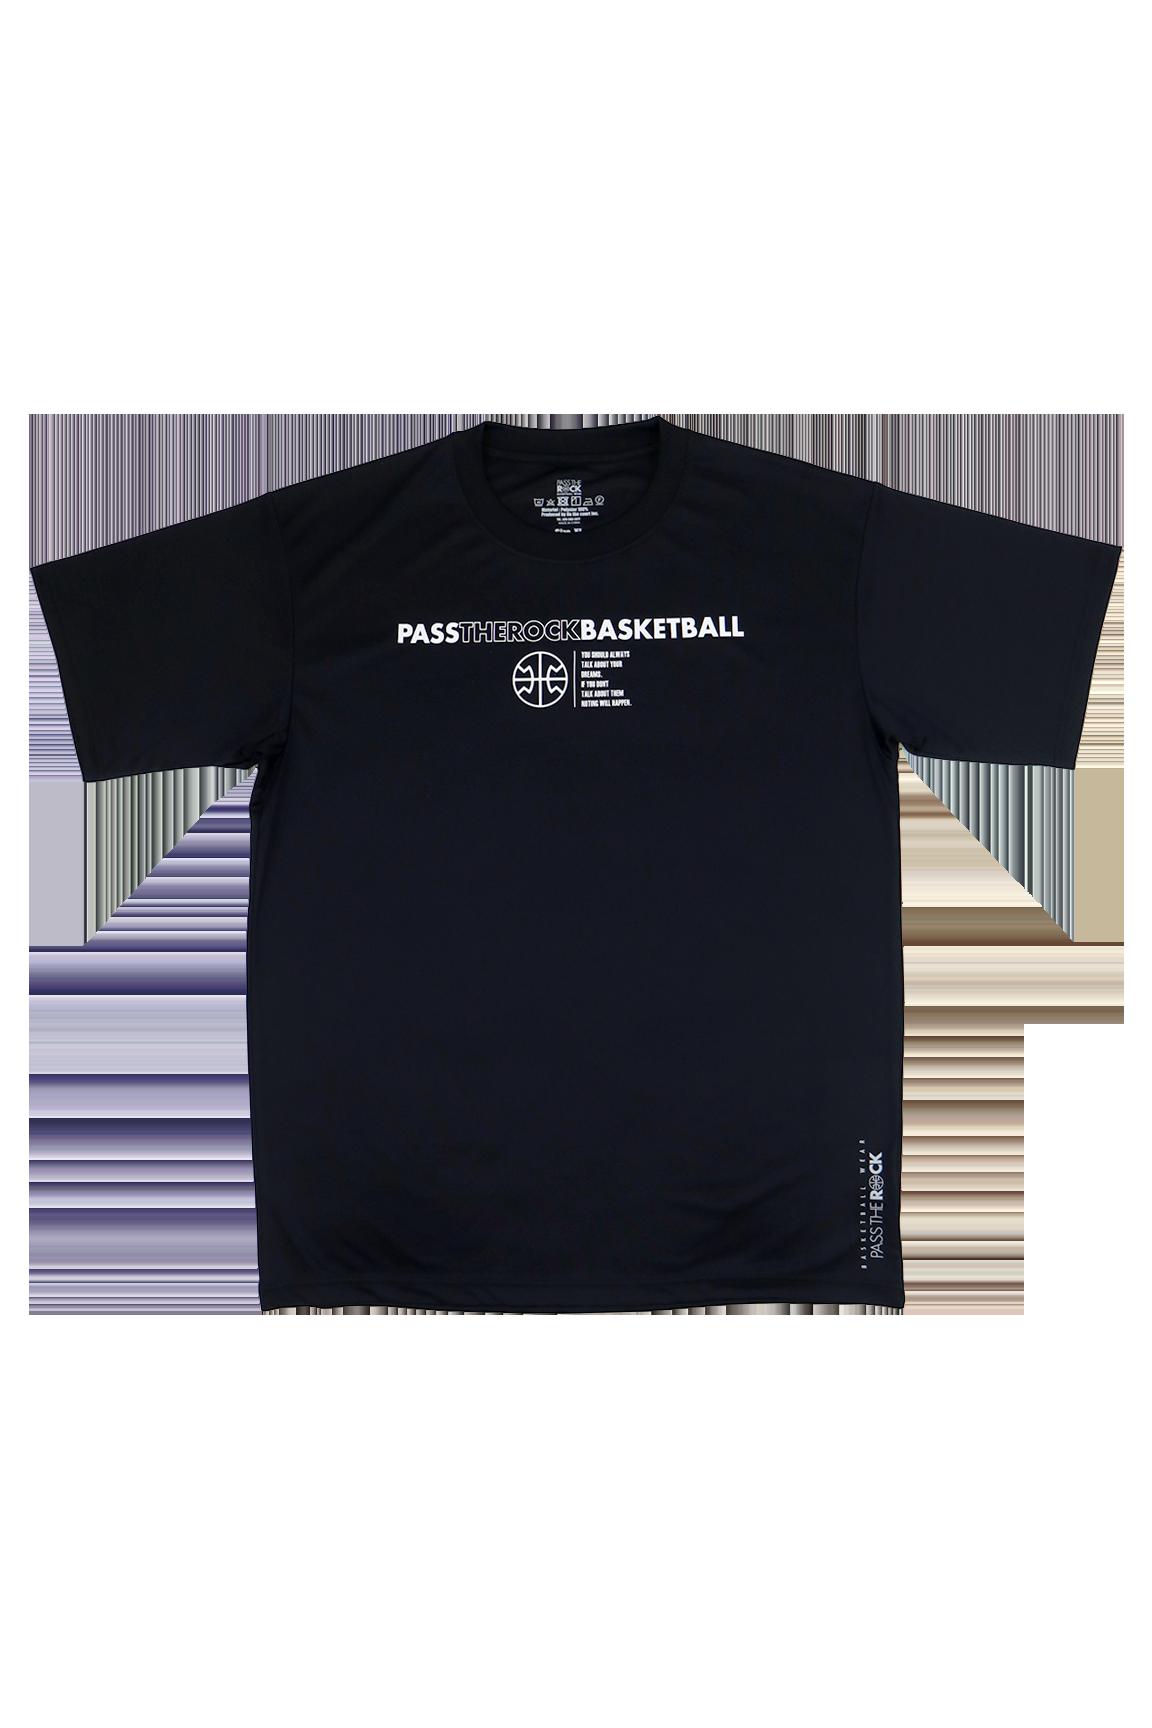 PTR-1254 /【2019春夏新作】 PASS THE ROCK / BASIC T-SHIRT / Tシャツ / プラクティスシャツ / パスザロック